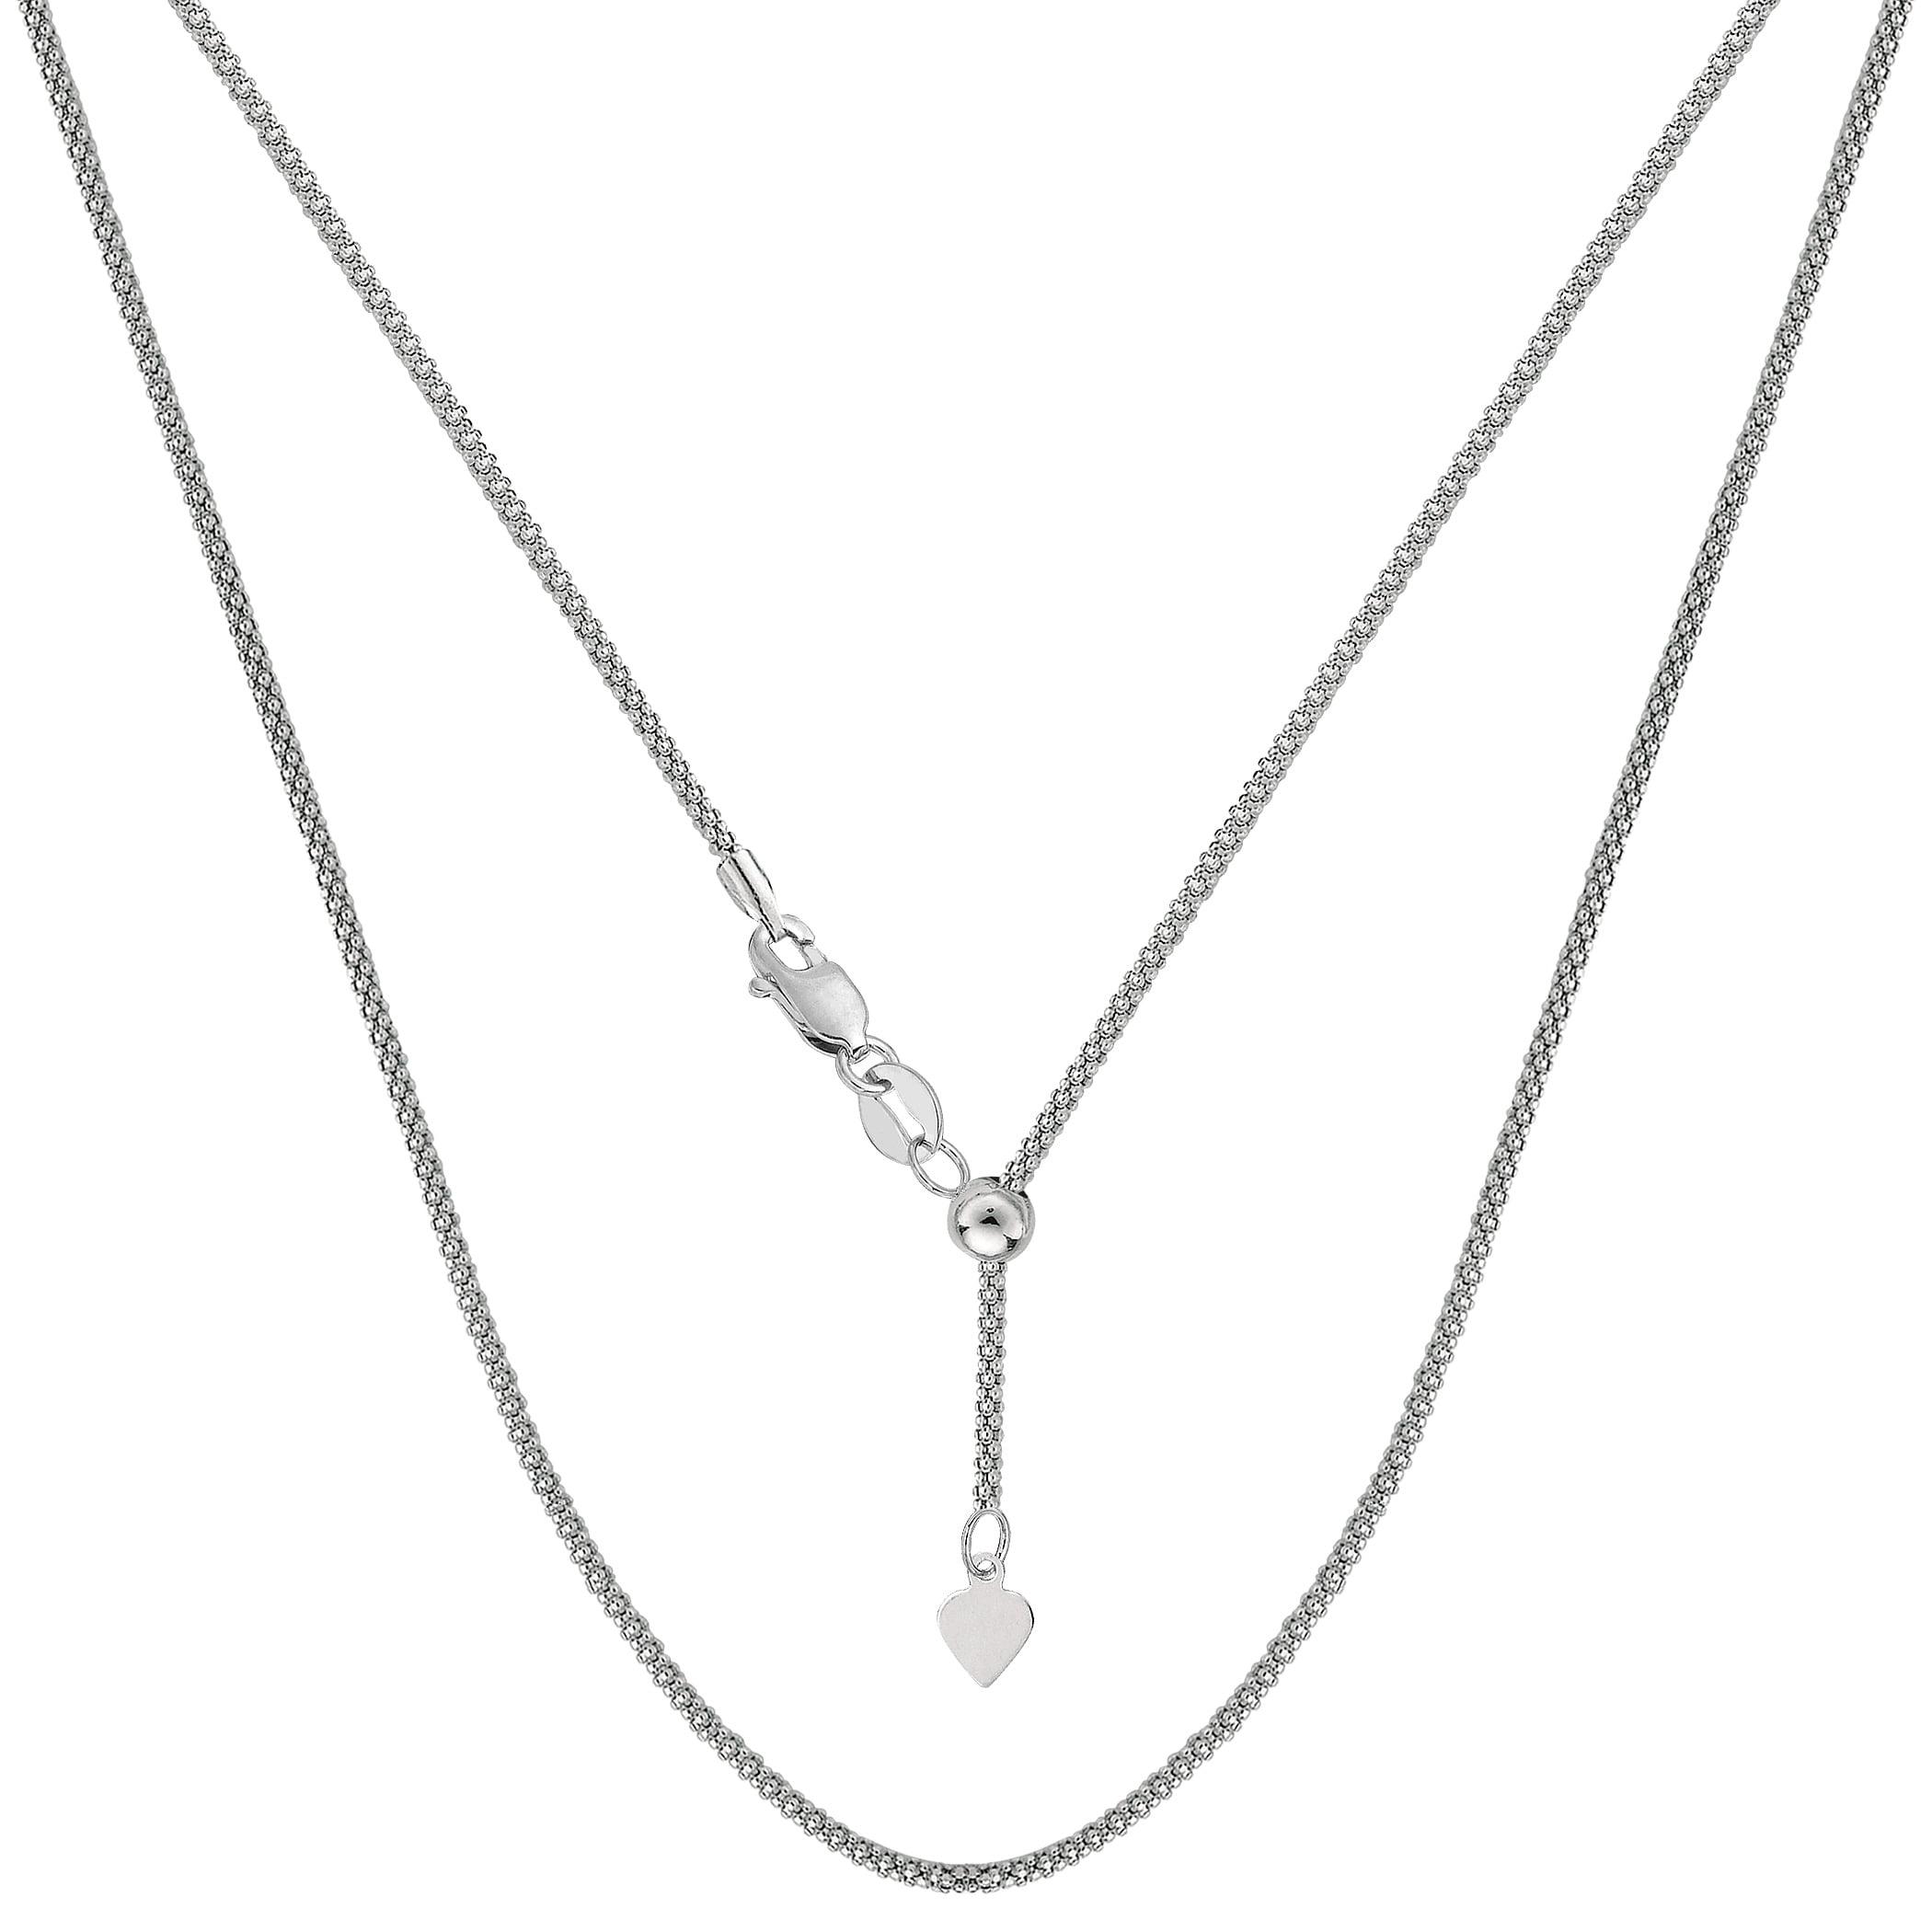 "JewelryAffairs 14k White Gold Adjustable Popcorn Link Chain Necklace, 1.3mm, 22"" by JewelryAffairs"